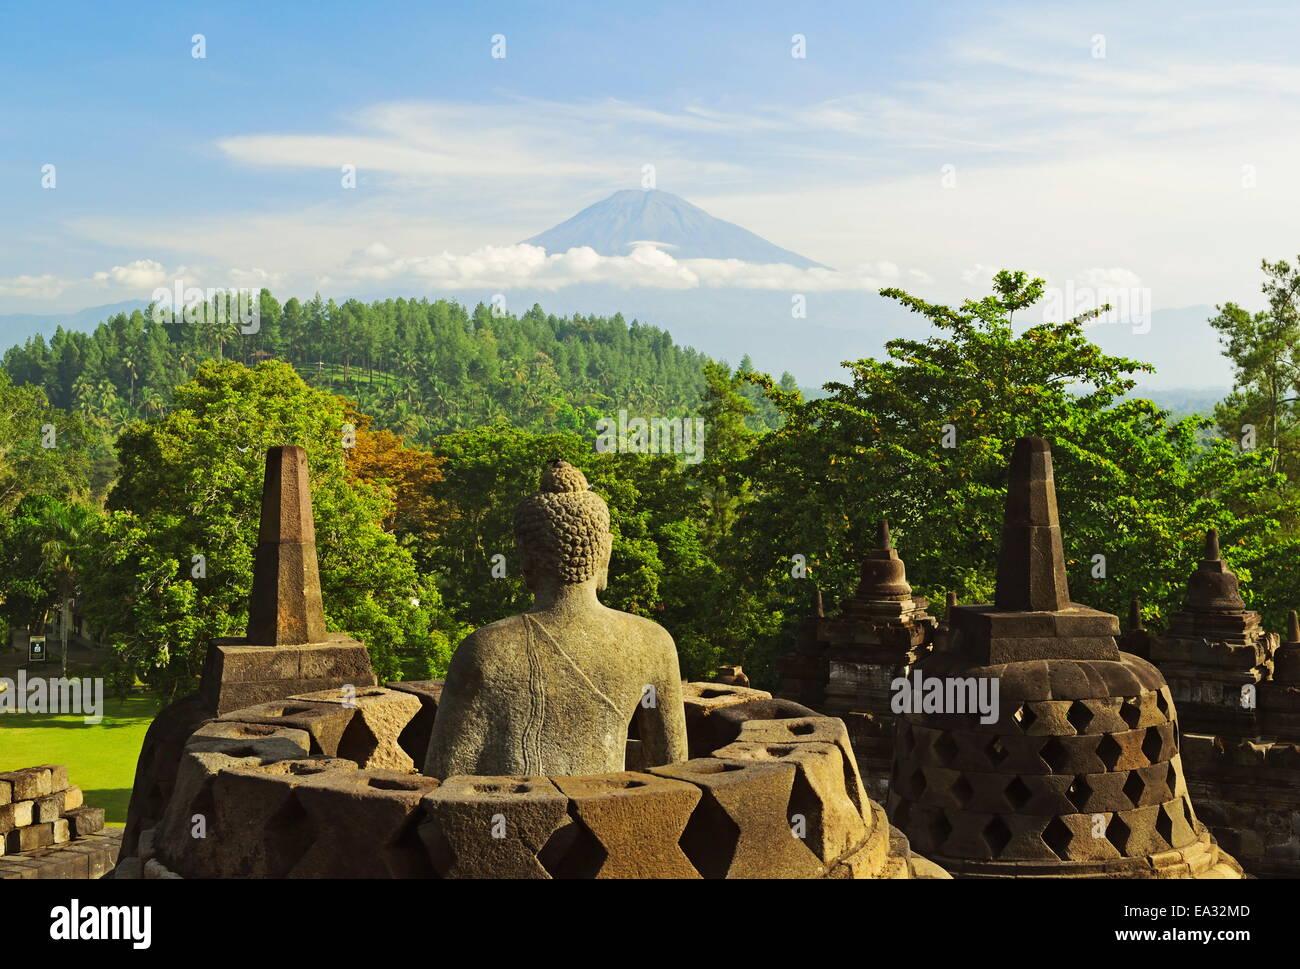 Borobodur, UNESCO World Heritage Site, with Mount Merapi in the distance, Kedu Plain, Java, Indonesia, Southeast - Stock Image